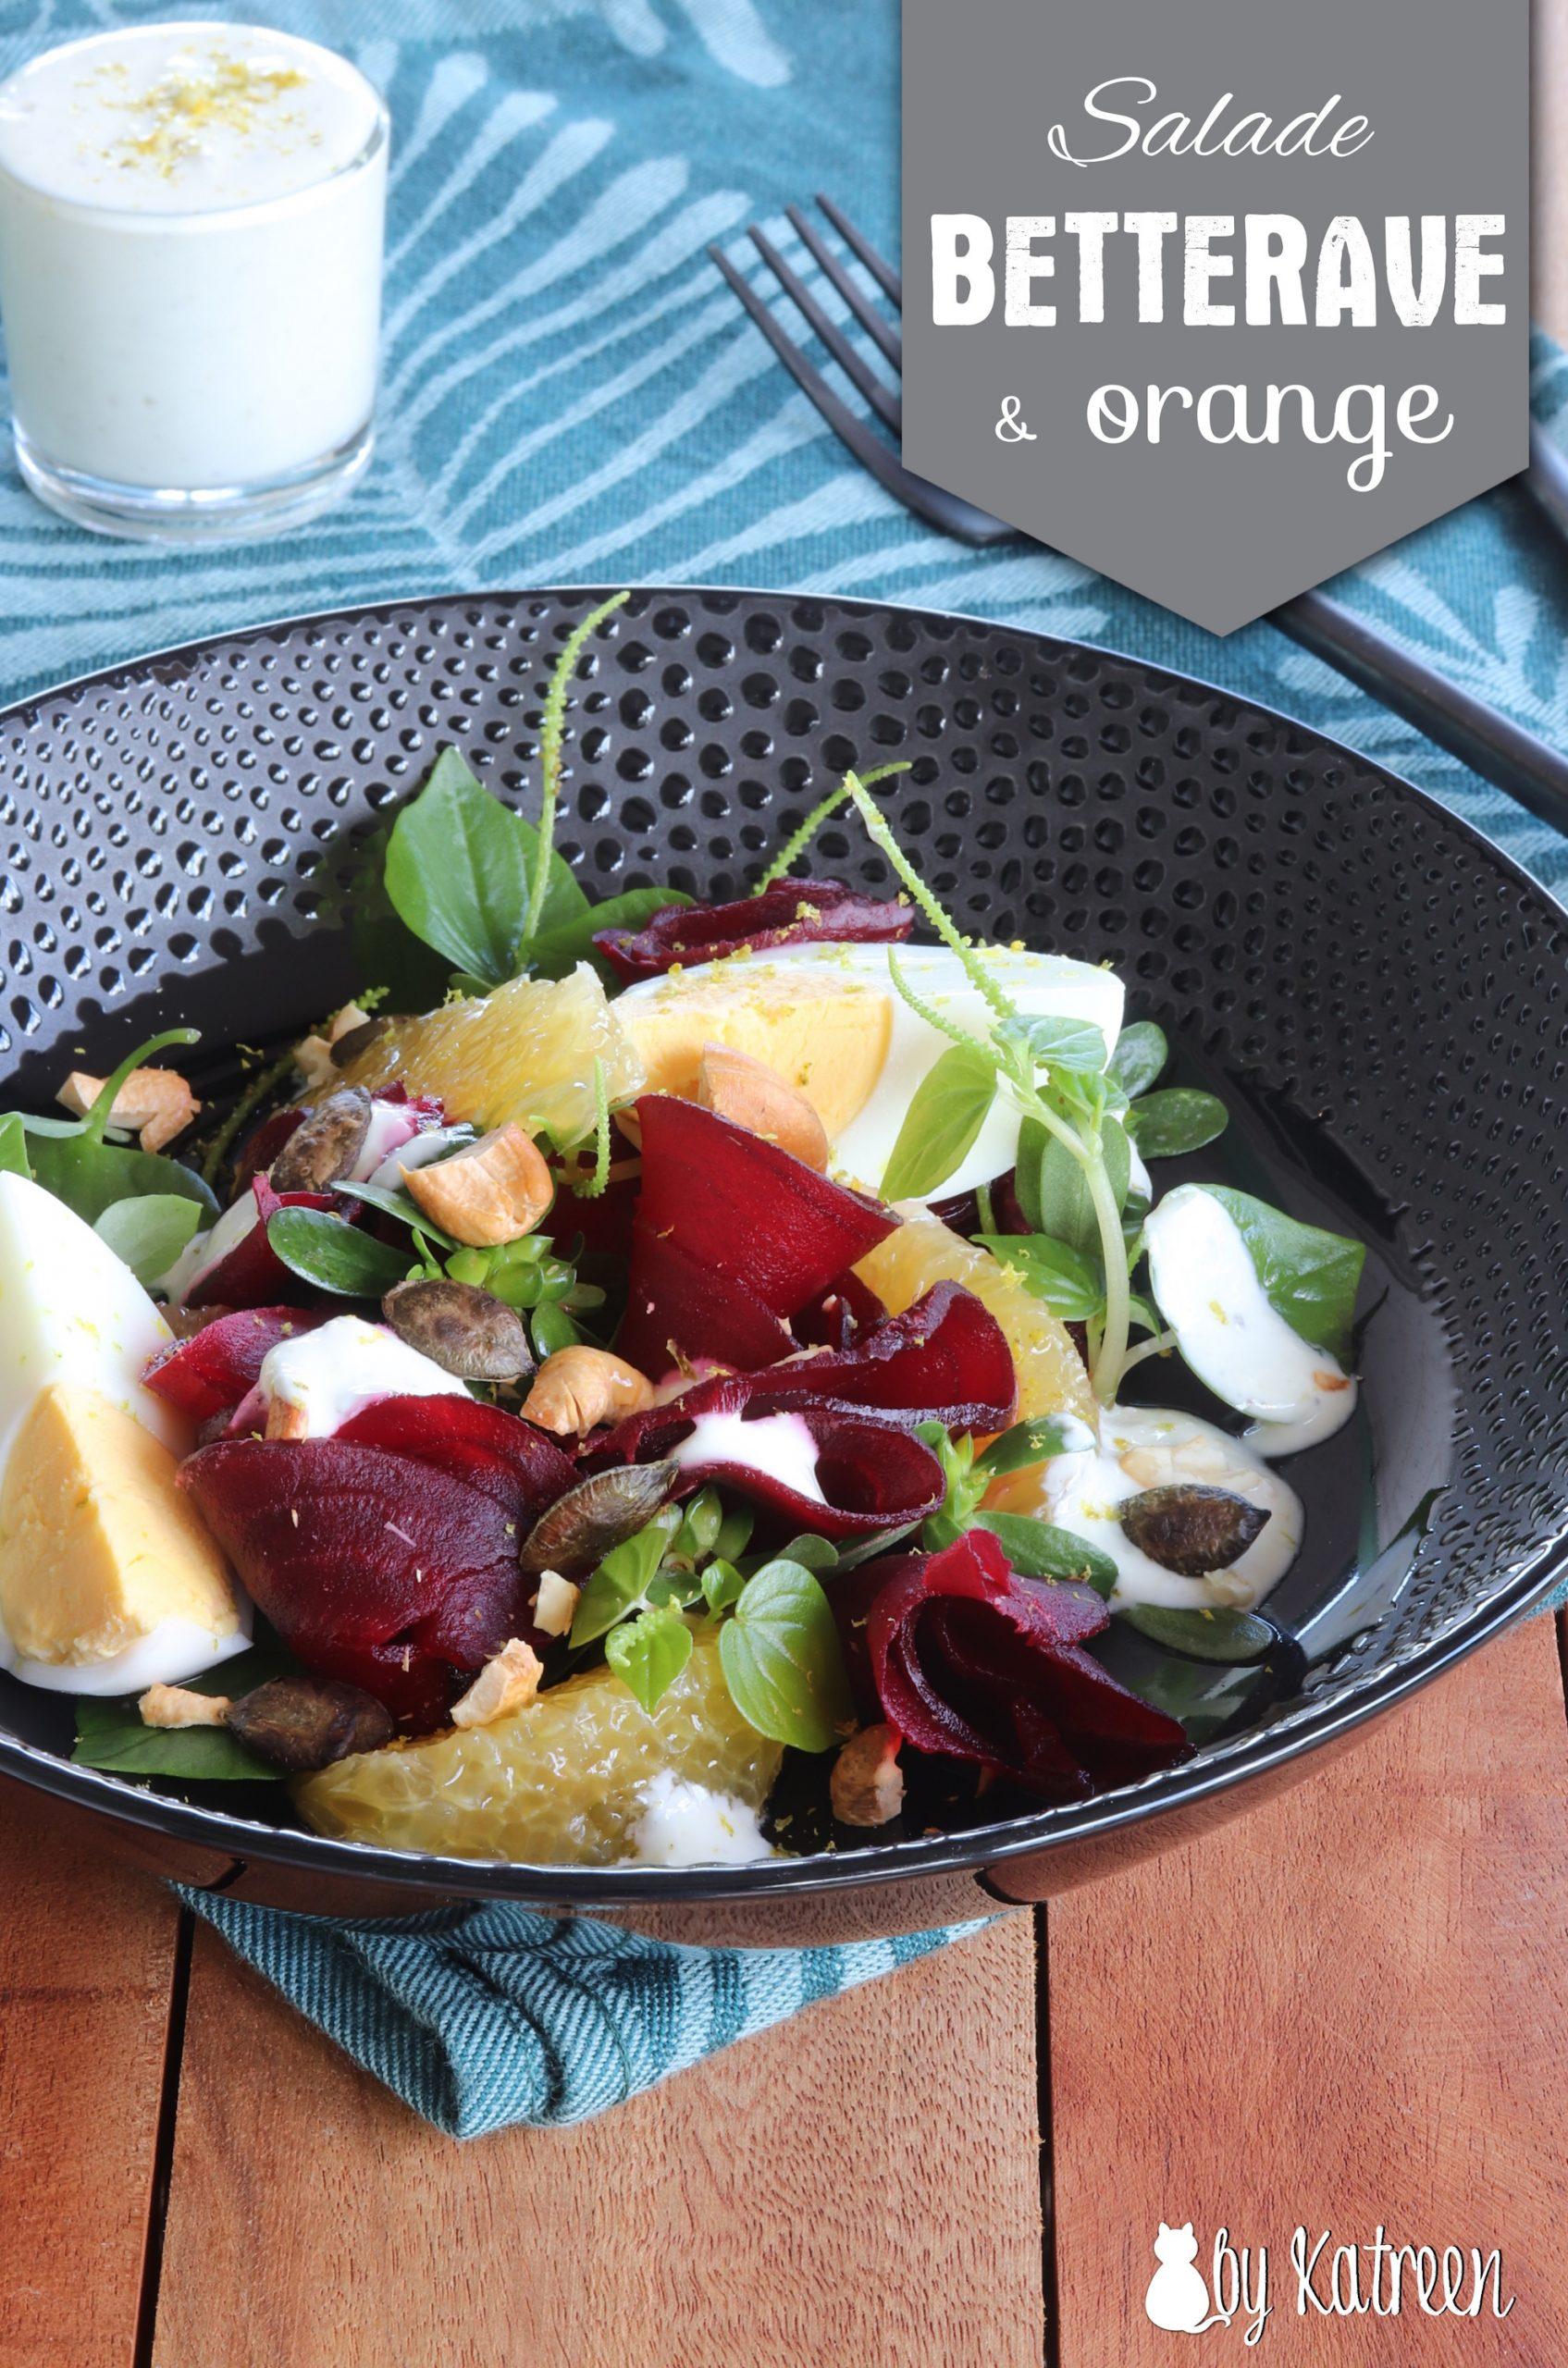 salade betterave et orange